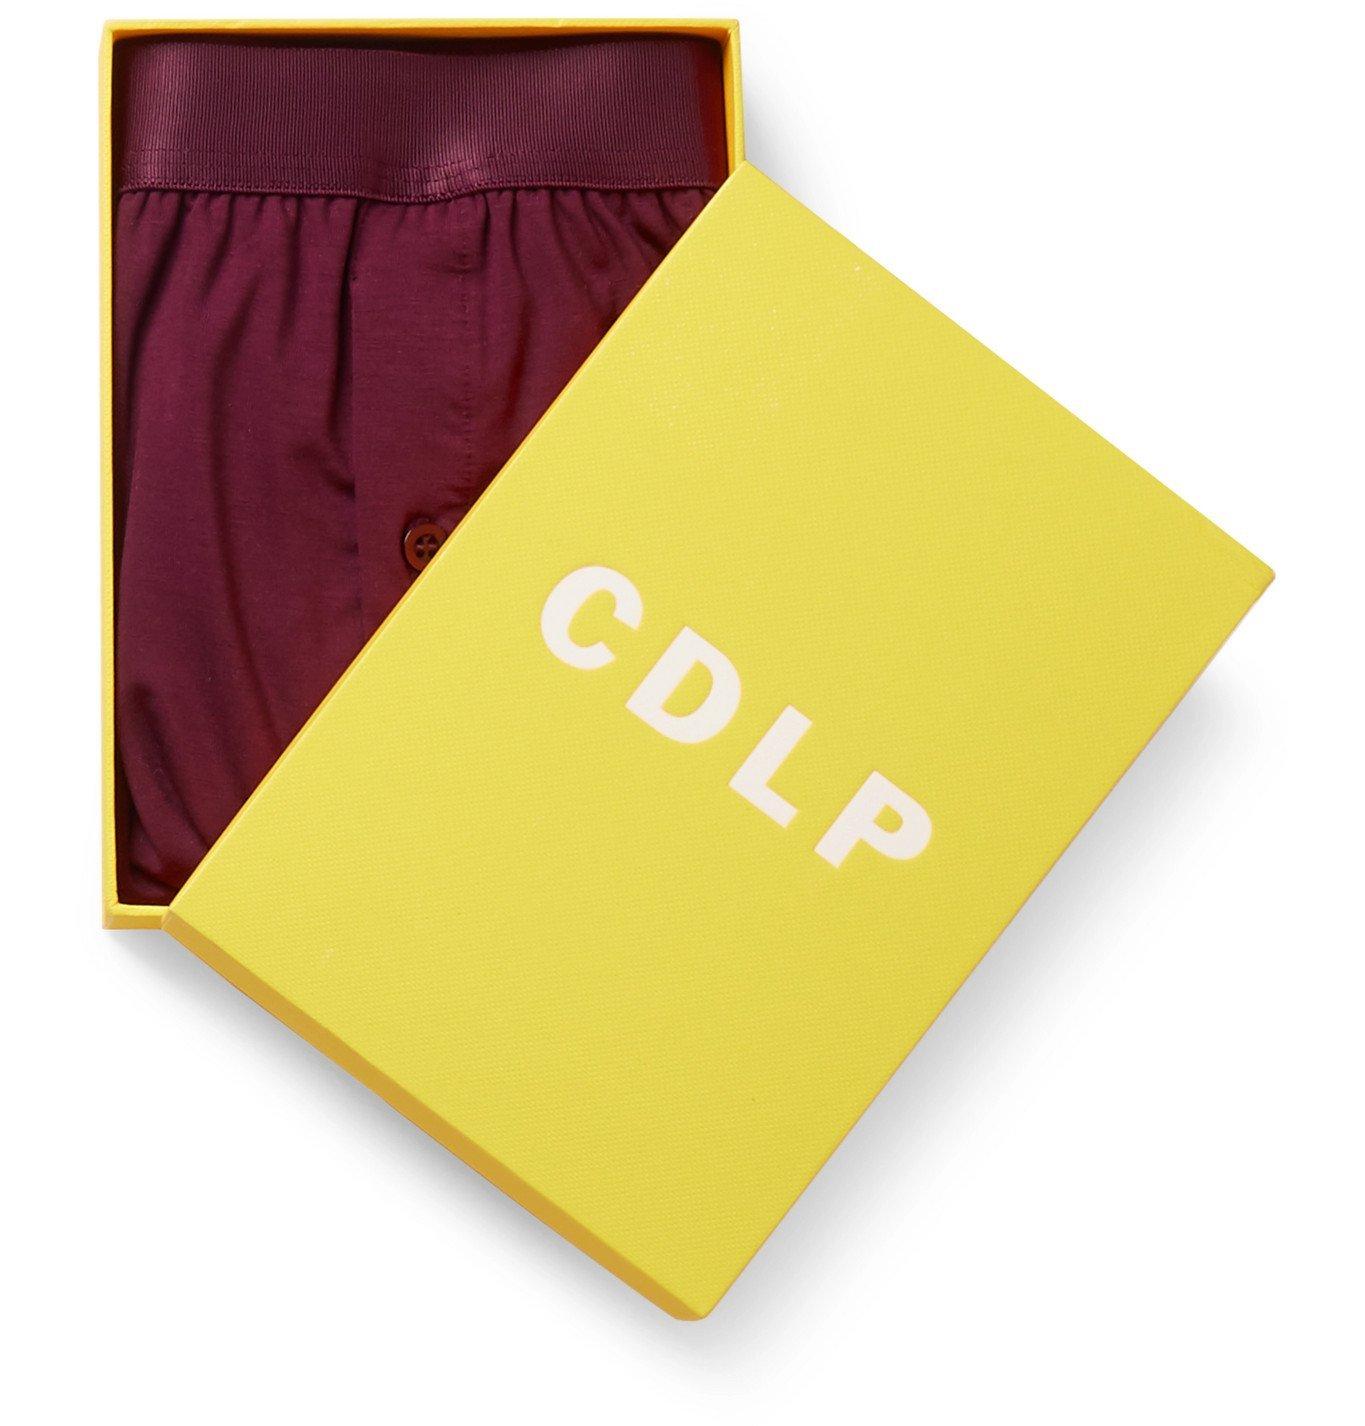 CDLP - Stretch-Lyocell Boxer Briefs - Burgundy